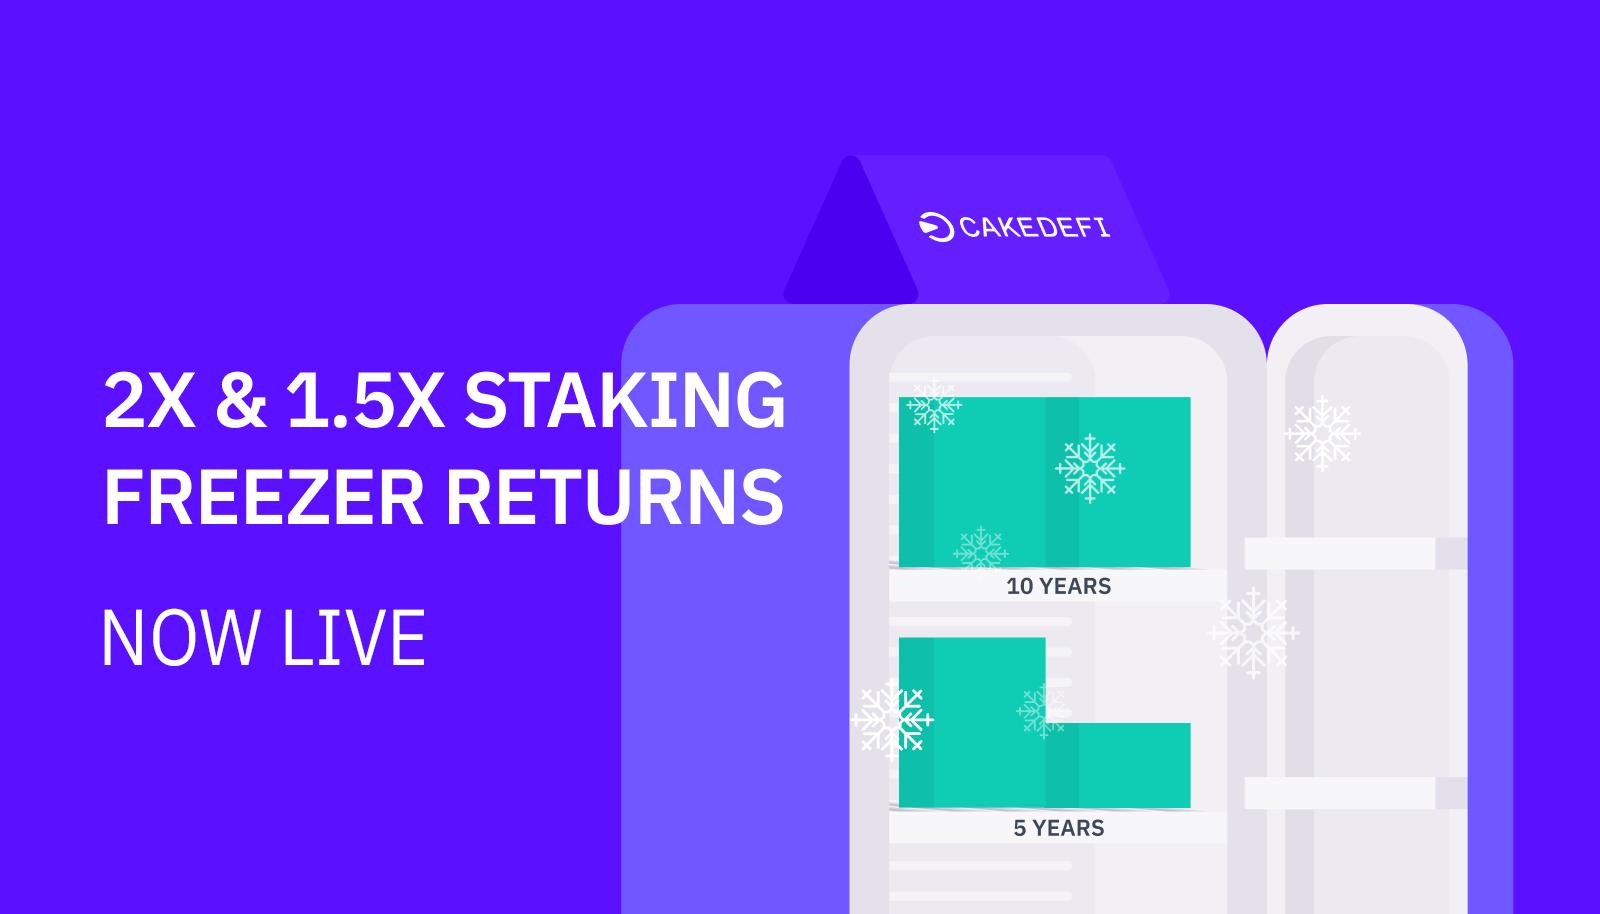 Introducing New 5 Year & 10 Year Freezer Rewards